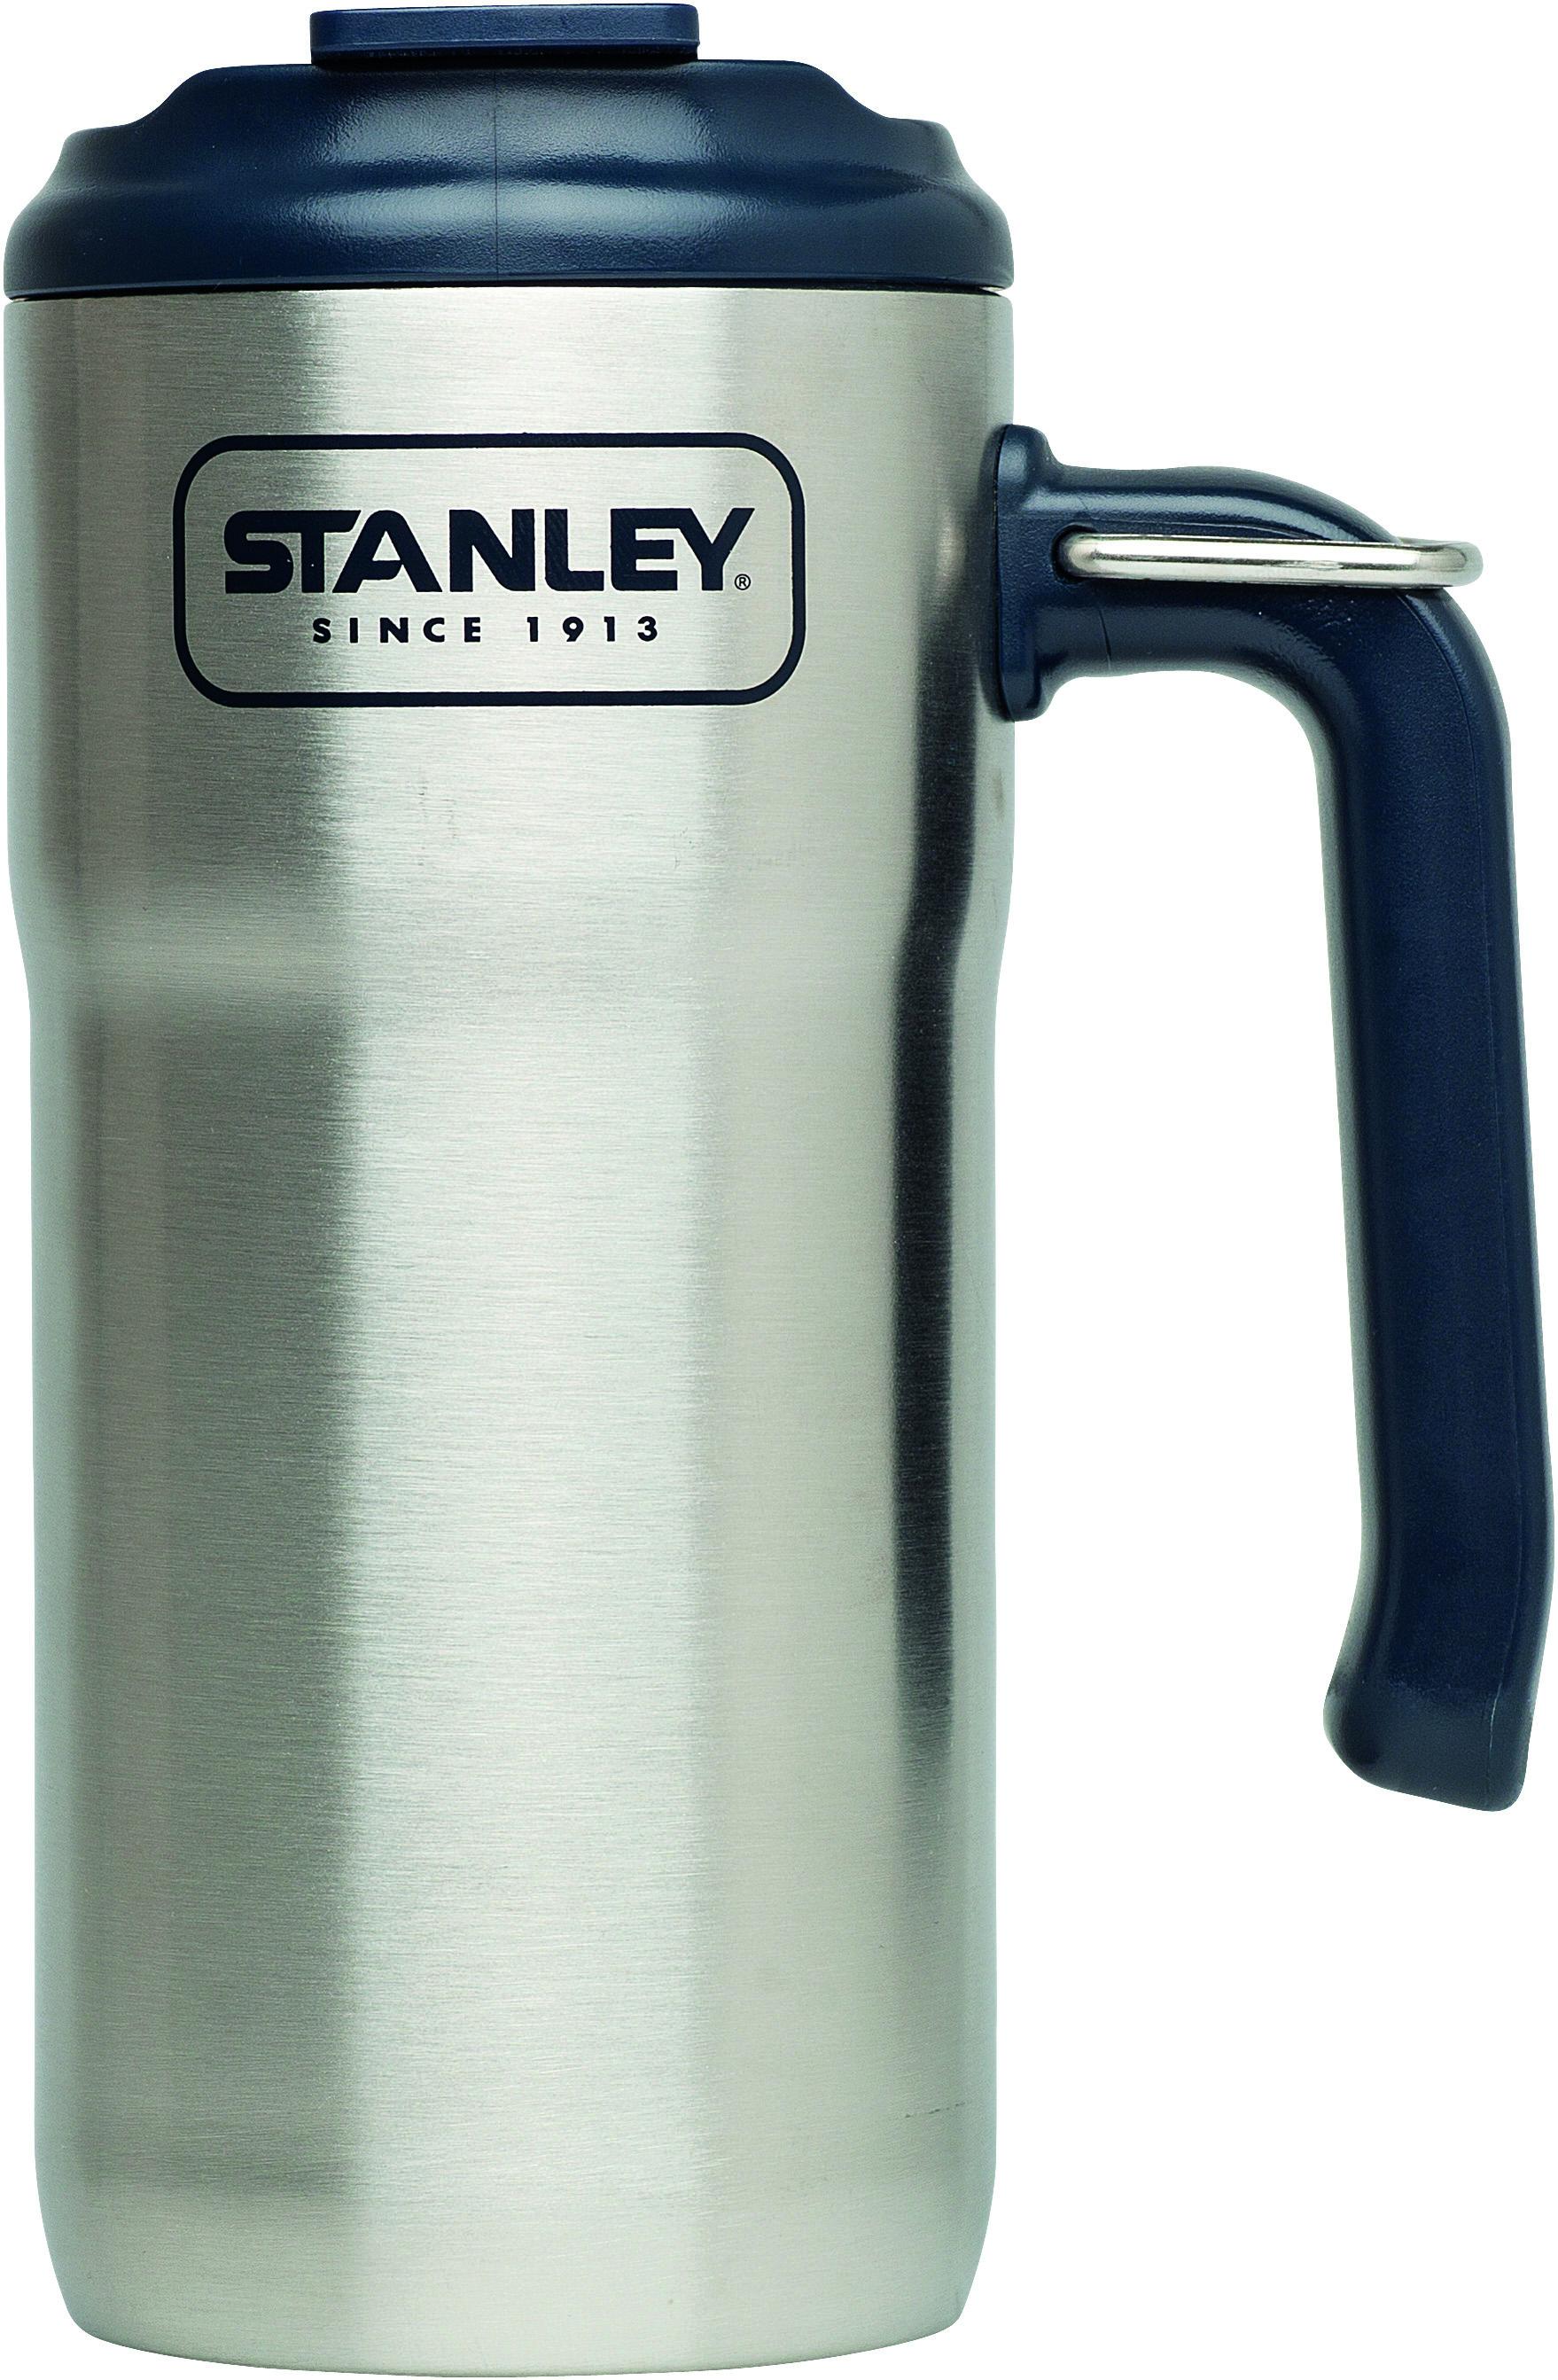 .. Stahl 18//8 Vakuumisoliert Stanley CLASSIC TRIGGER-ACTION TRAVEL MUG 354 ml